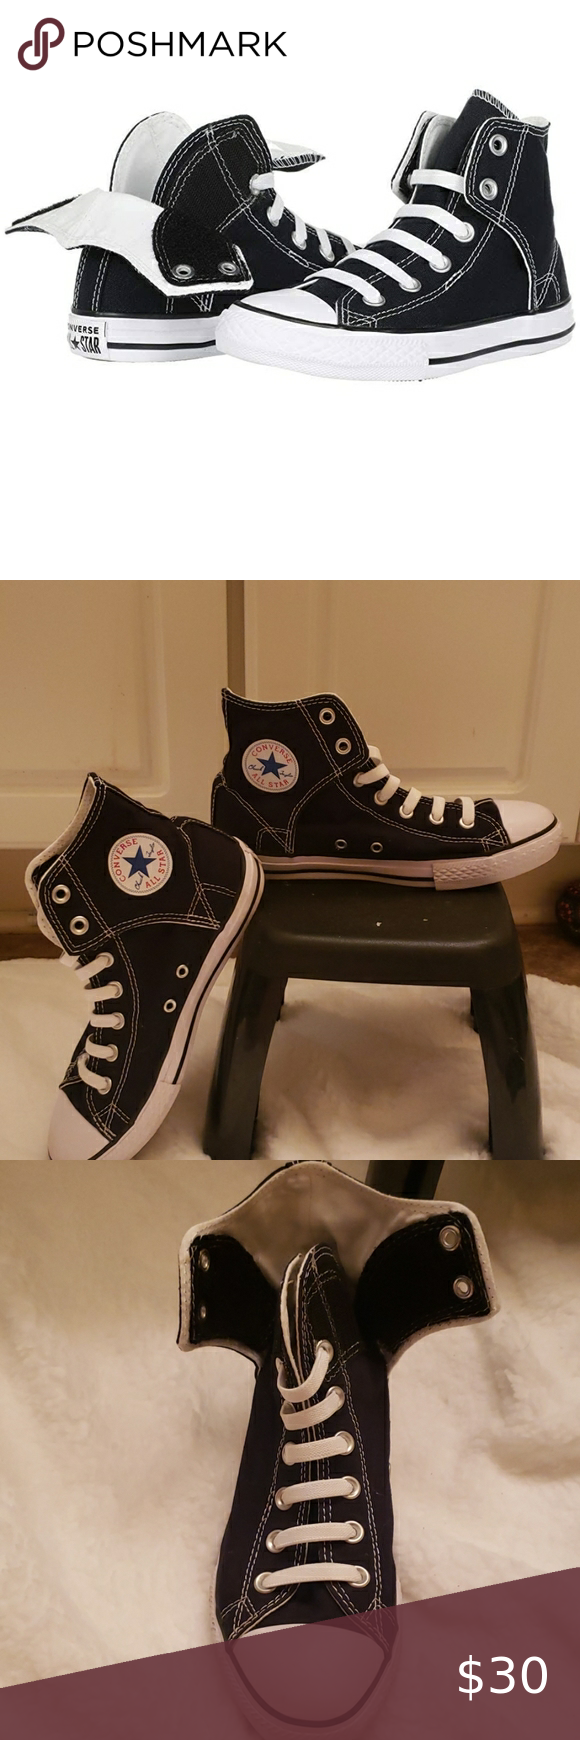 Converse Allstars High tops with velcro